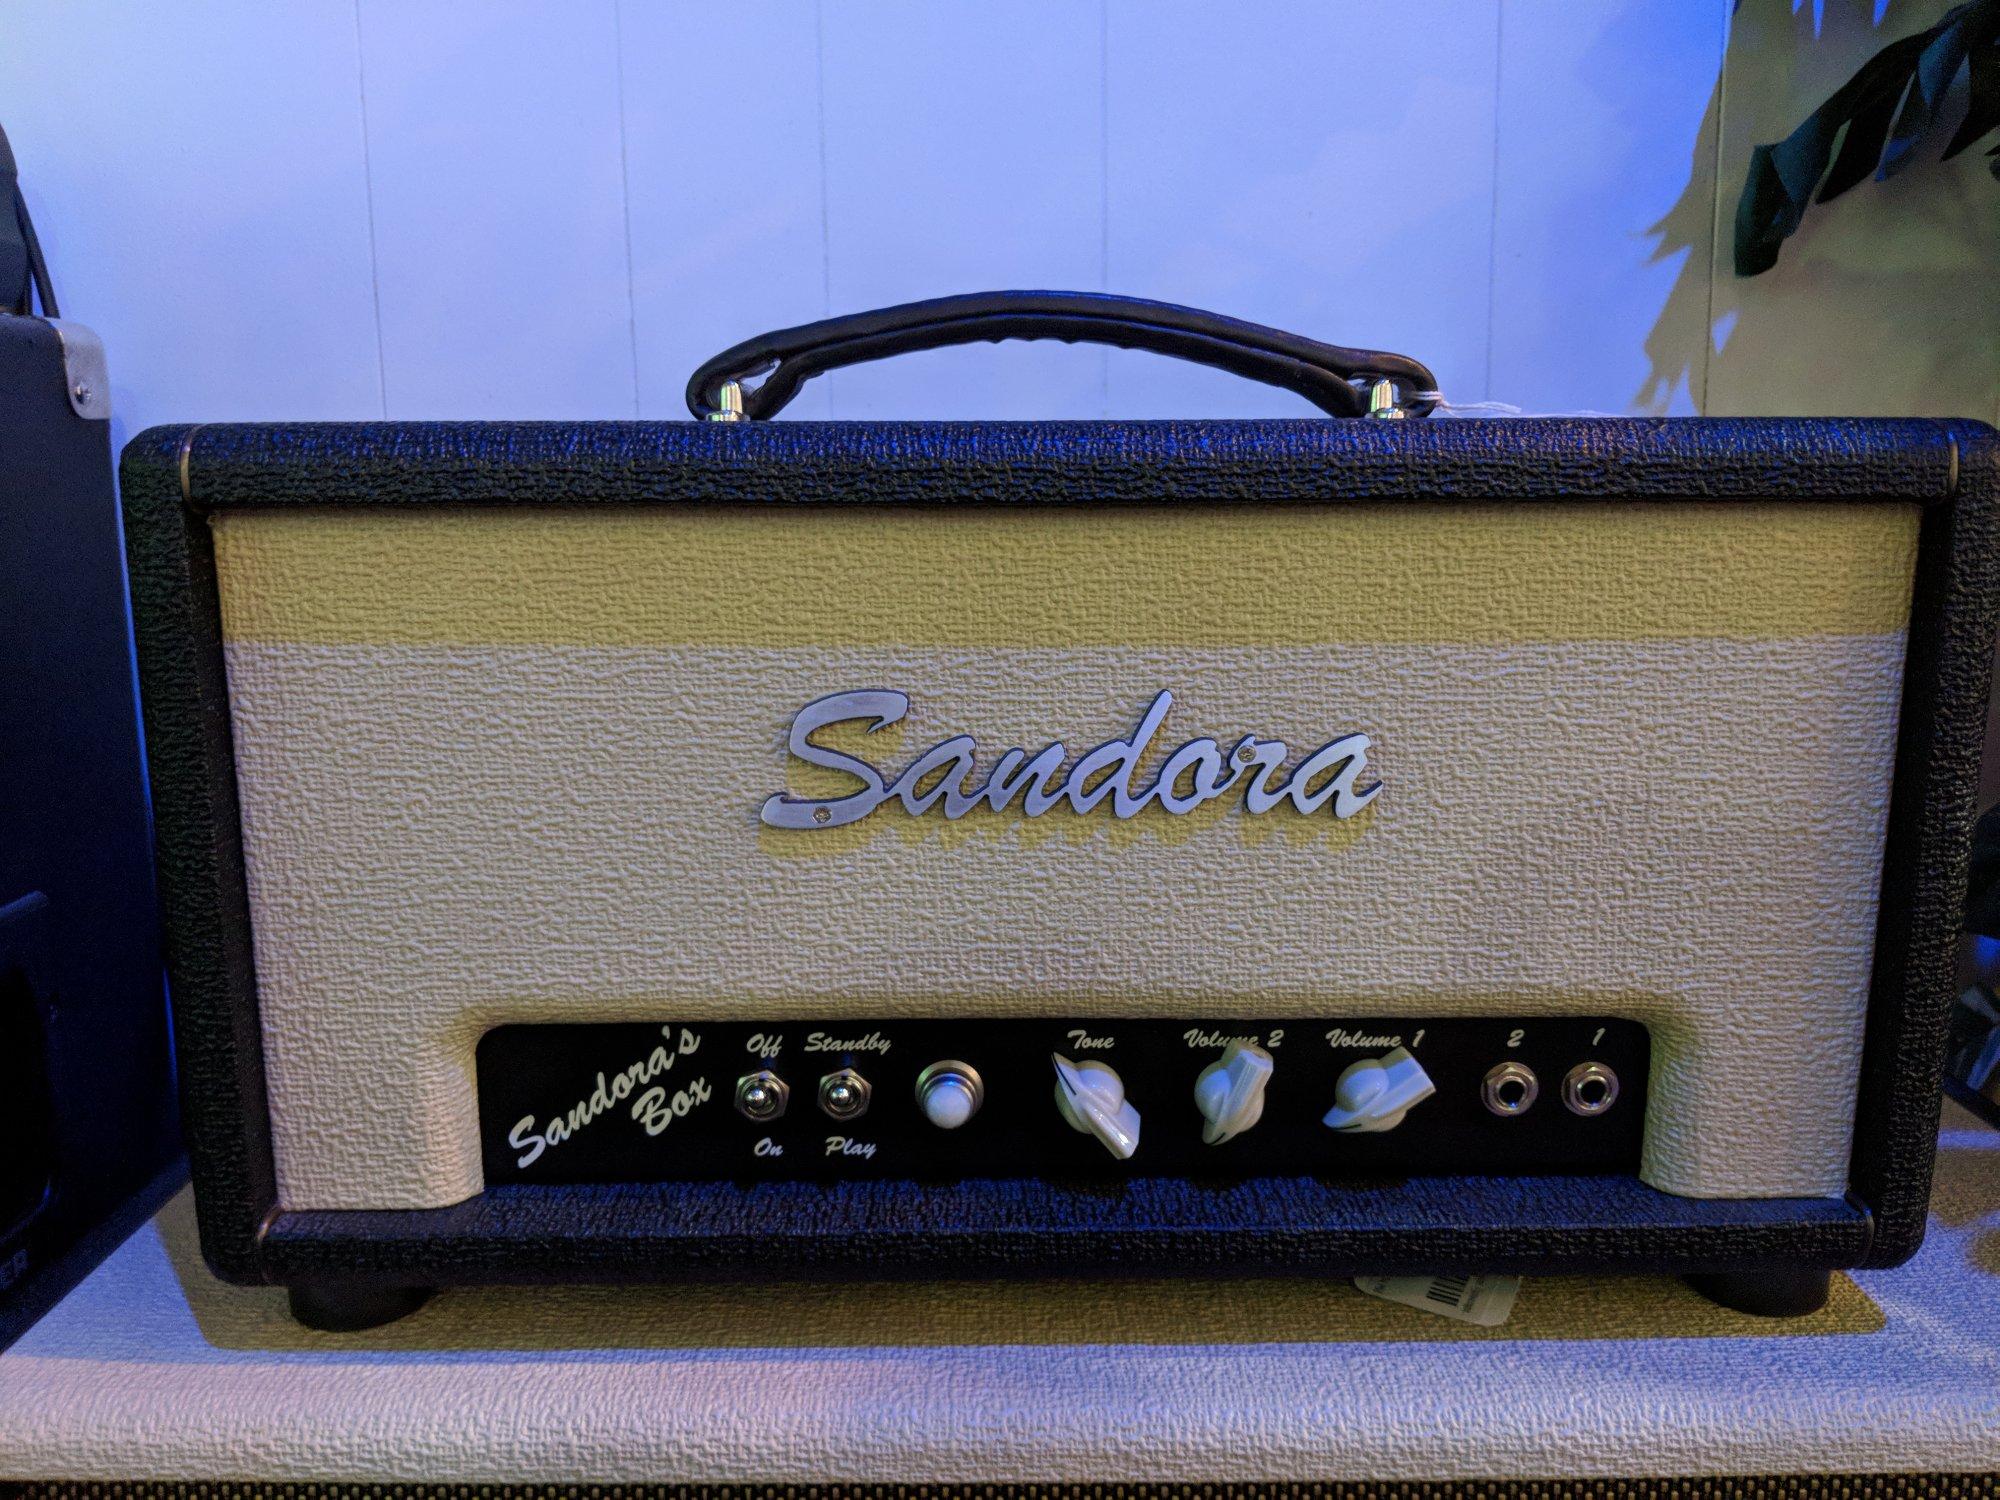 Sandora BH